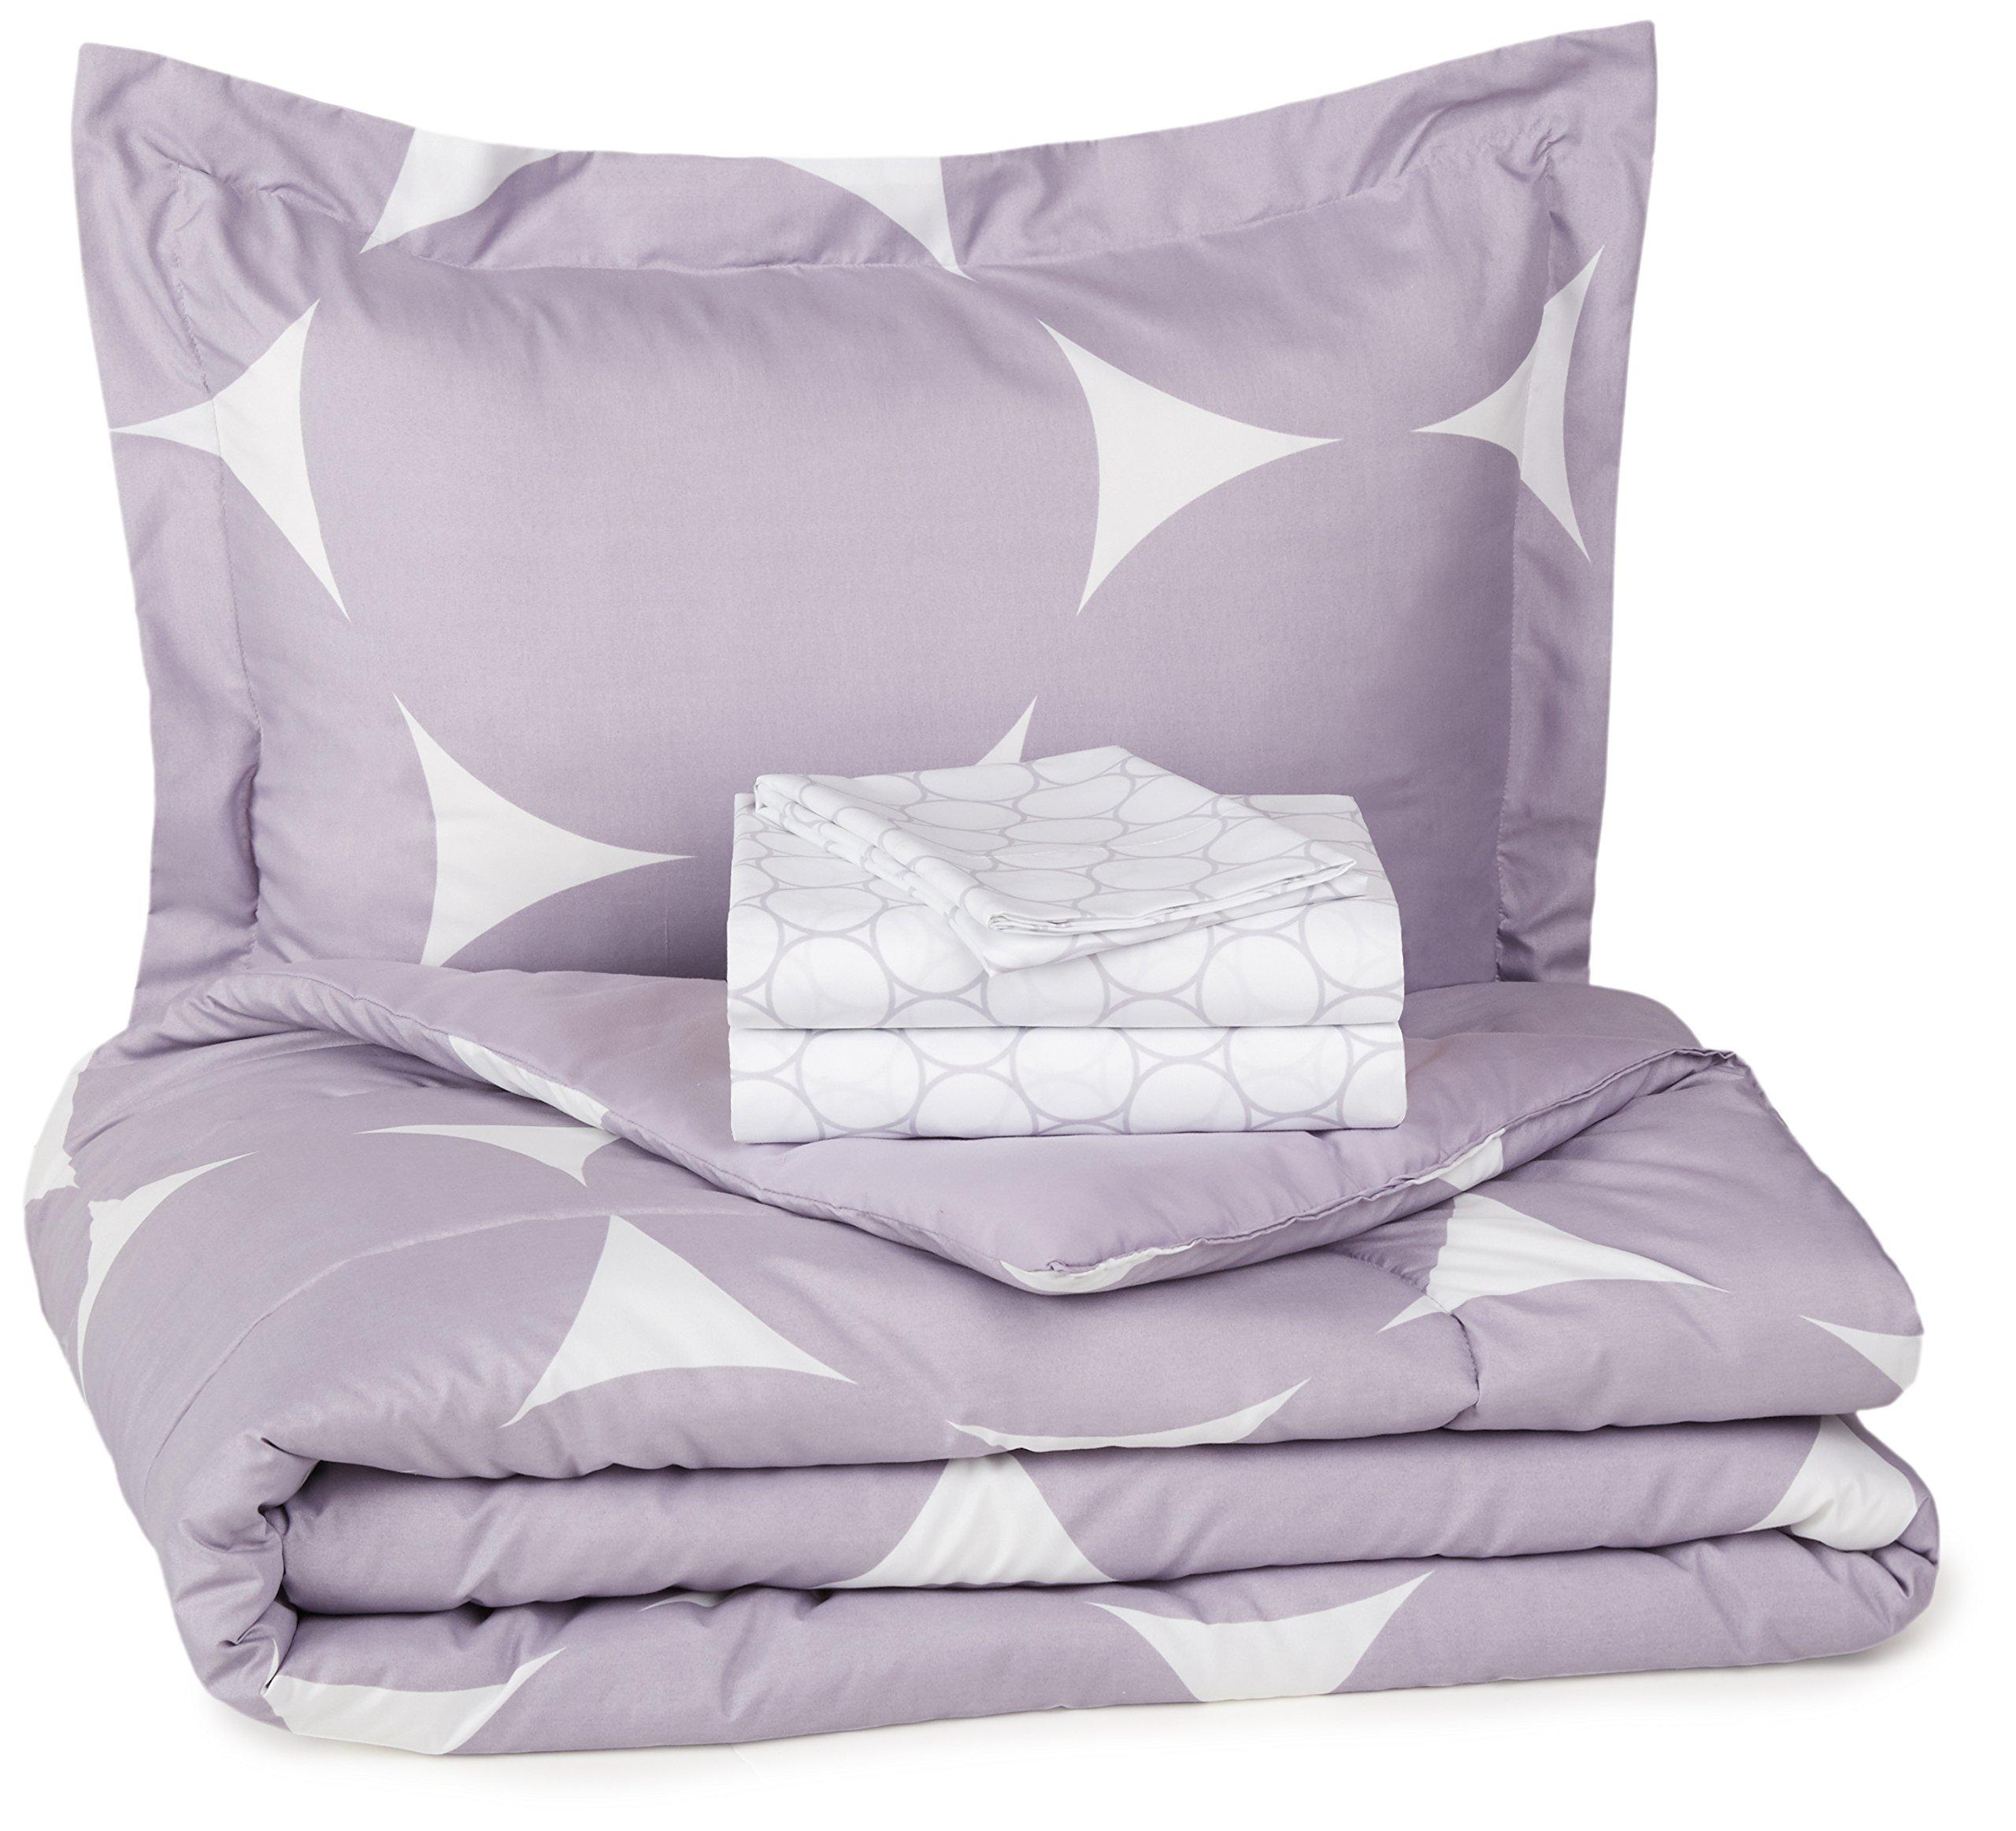 AmazonBasics 5 Piece Bed Bag Extra Long